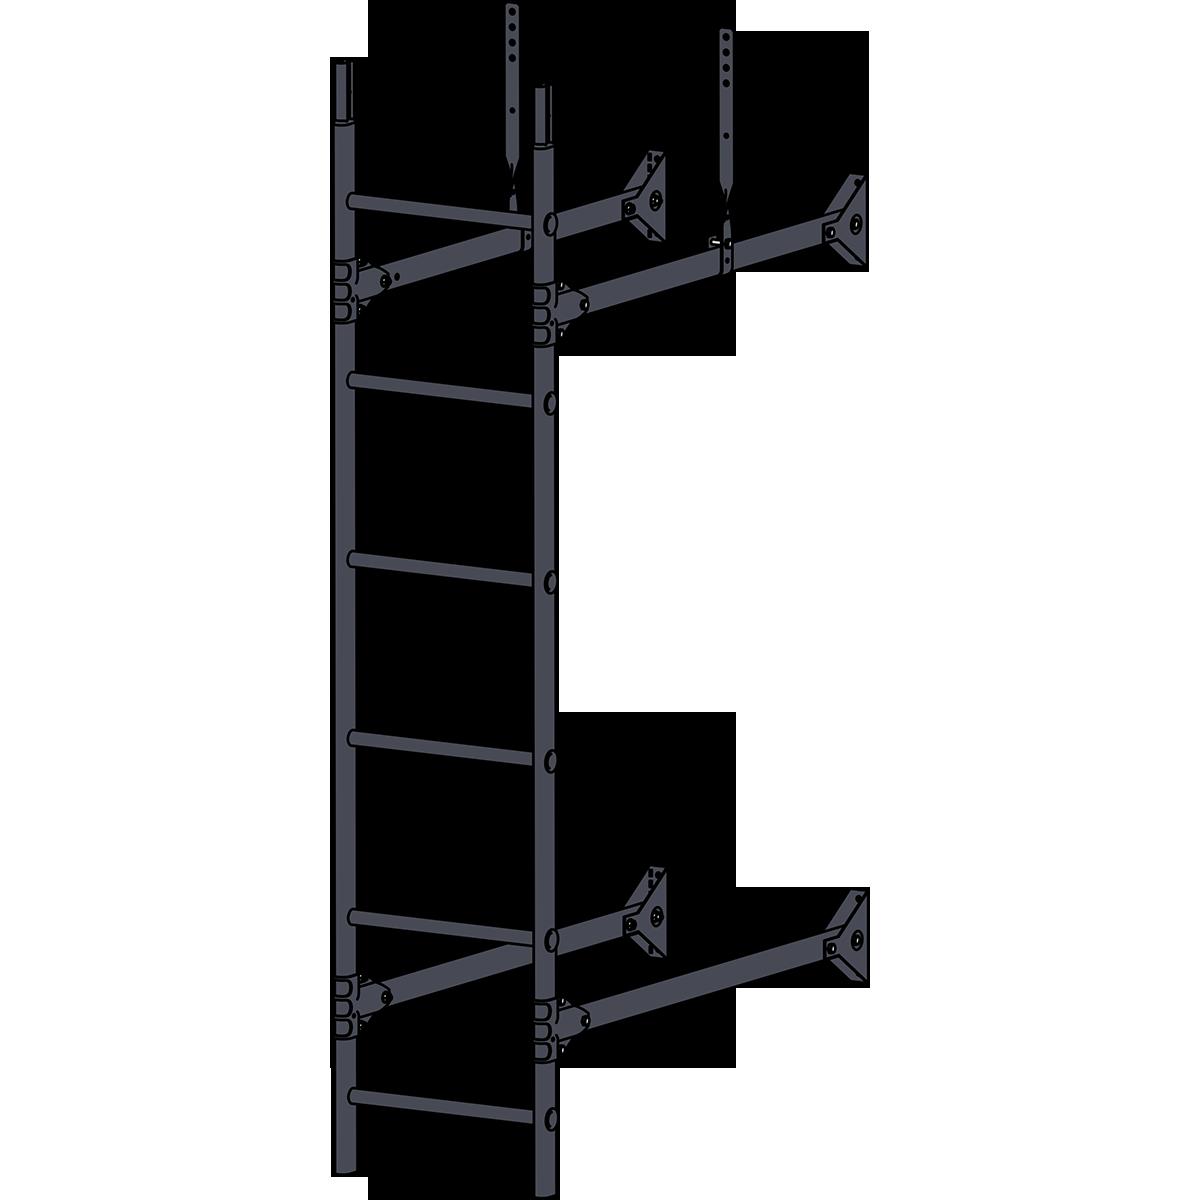 Лестница стеновая ROOFSYSTEMS PRESTIGE ZN 1,2 м RAL 7024 Серый графит